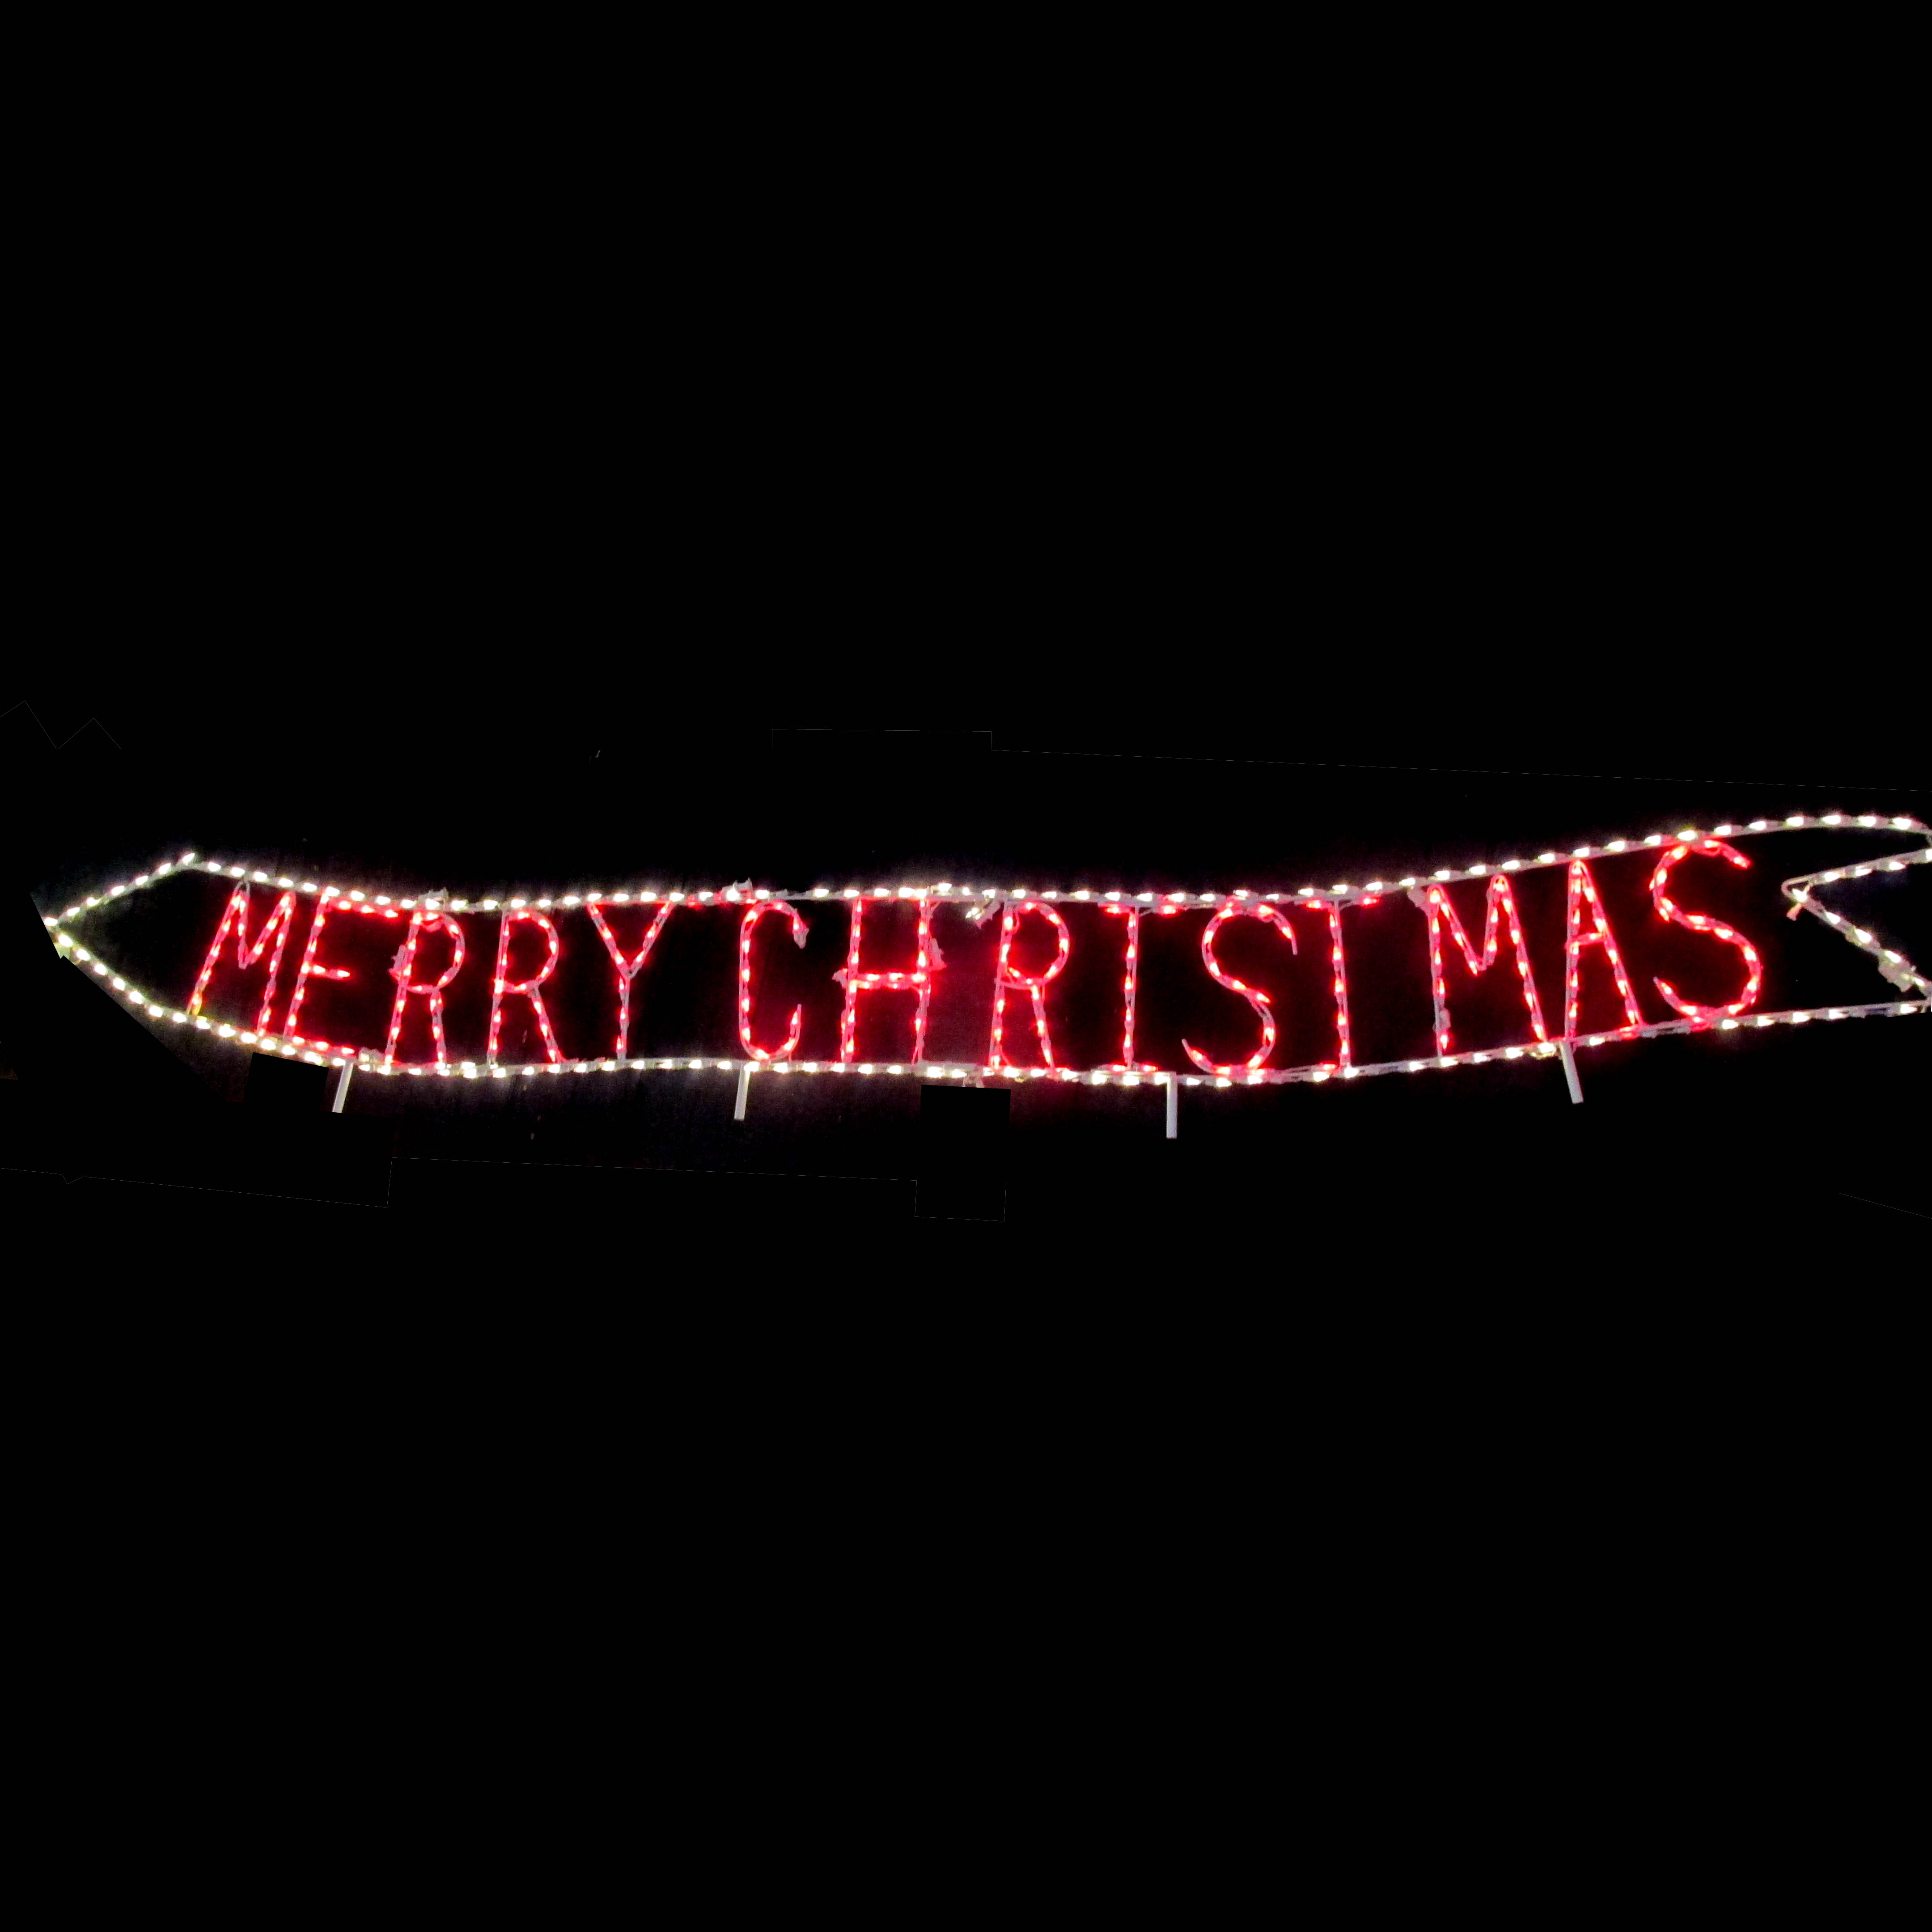 Airplane Banner says Merry Christmas display